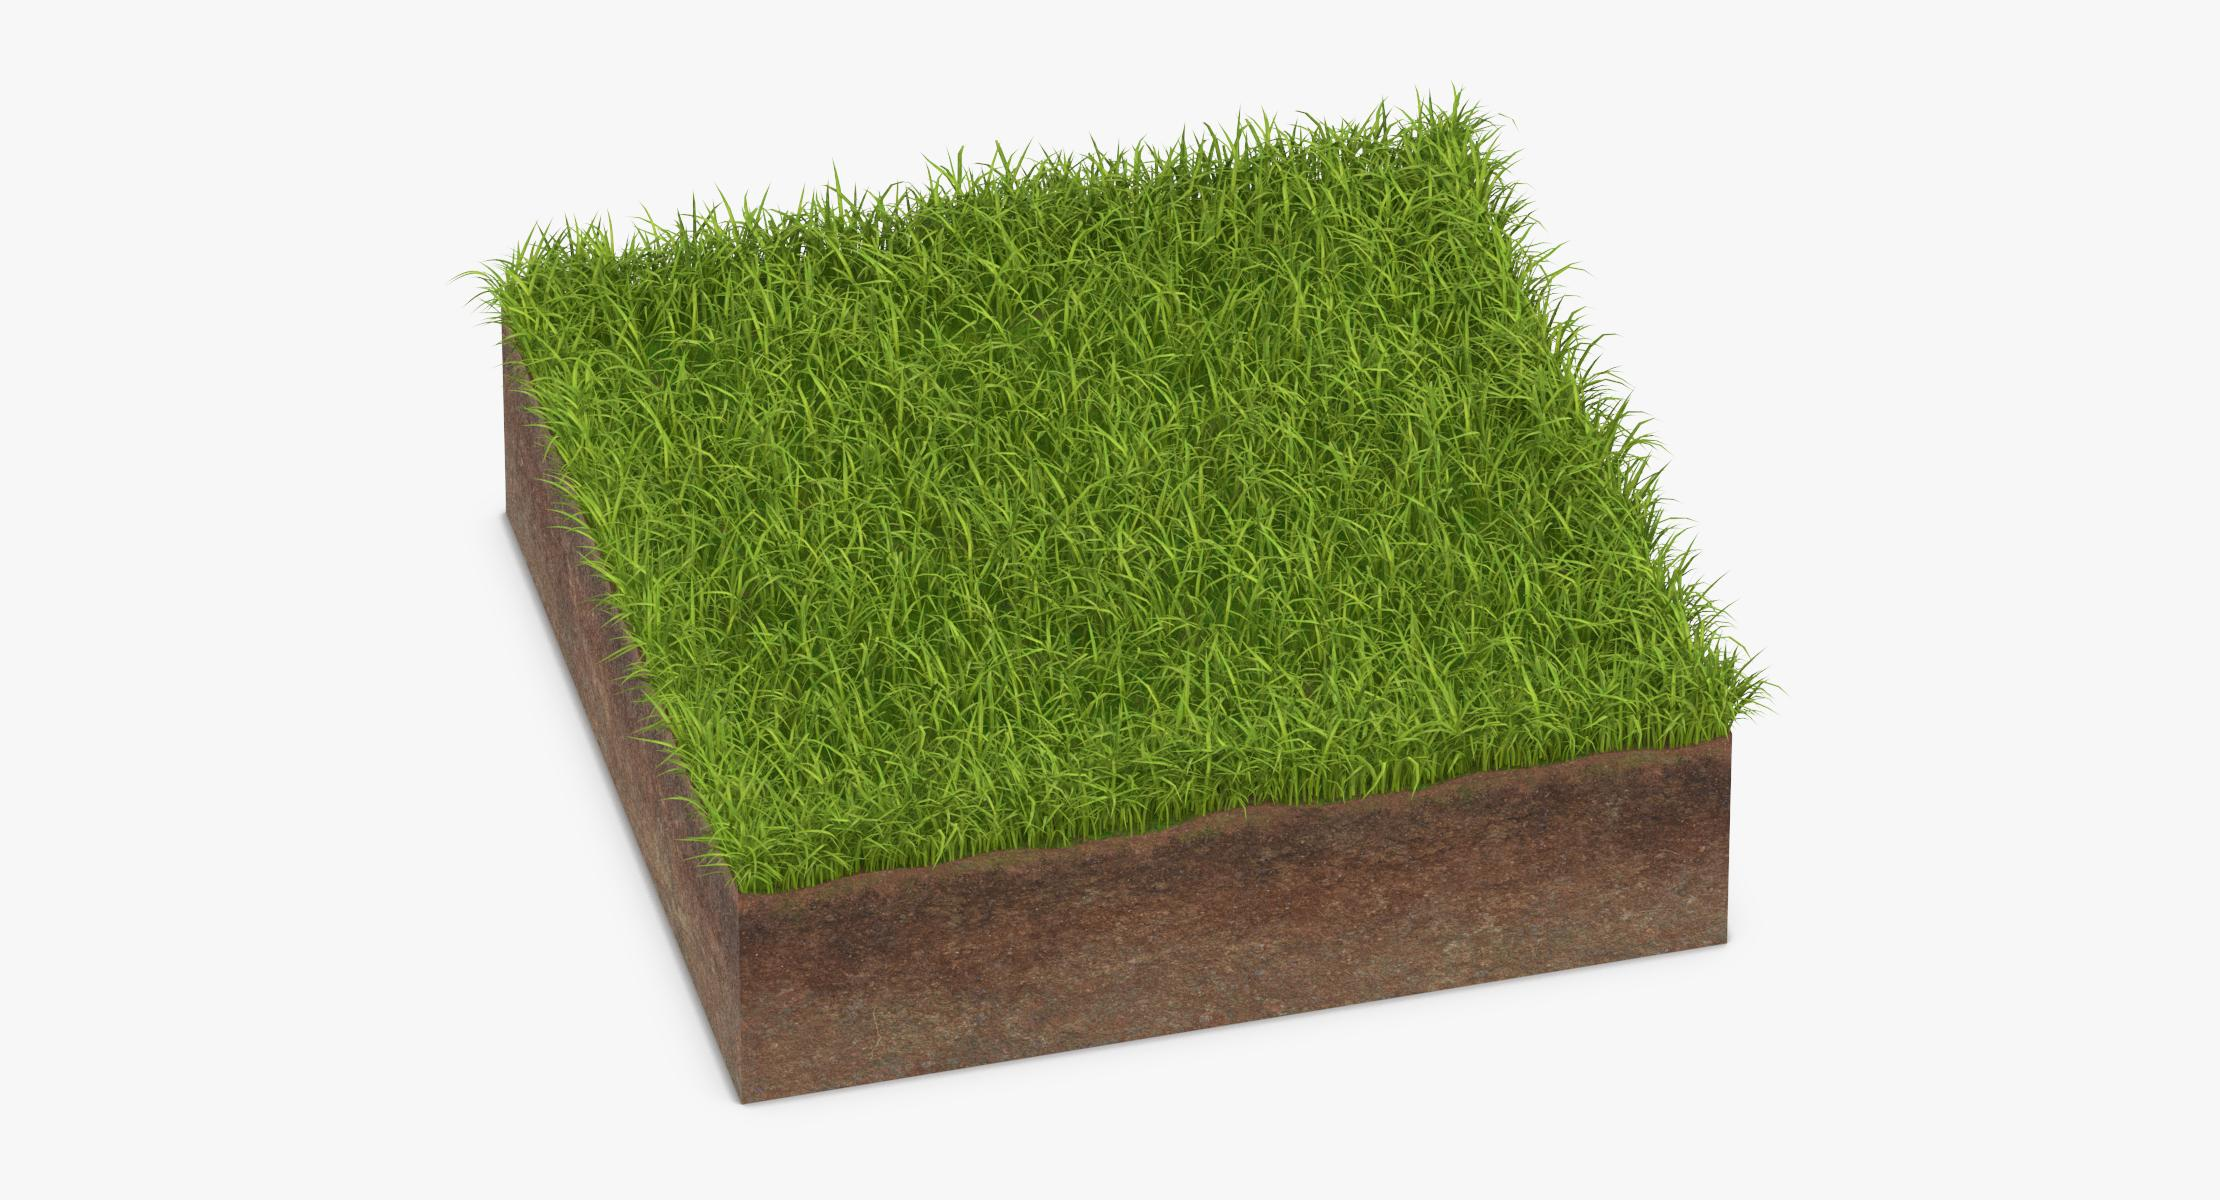 Grass Cross Sections 01 - reel 1